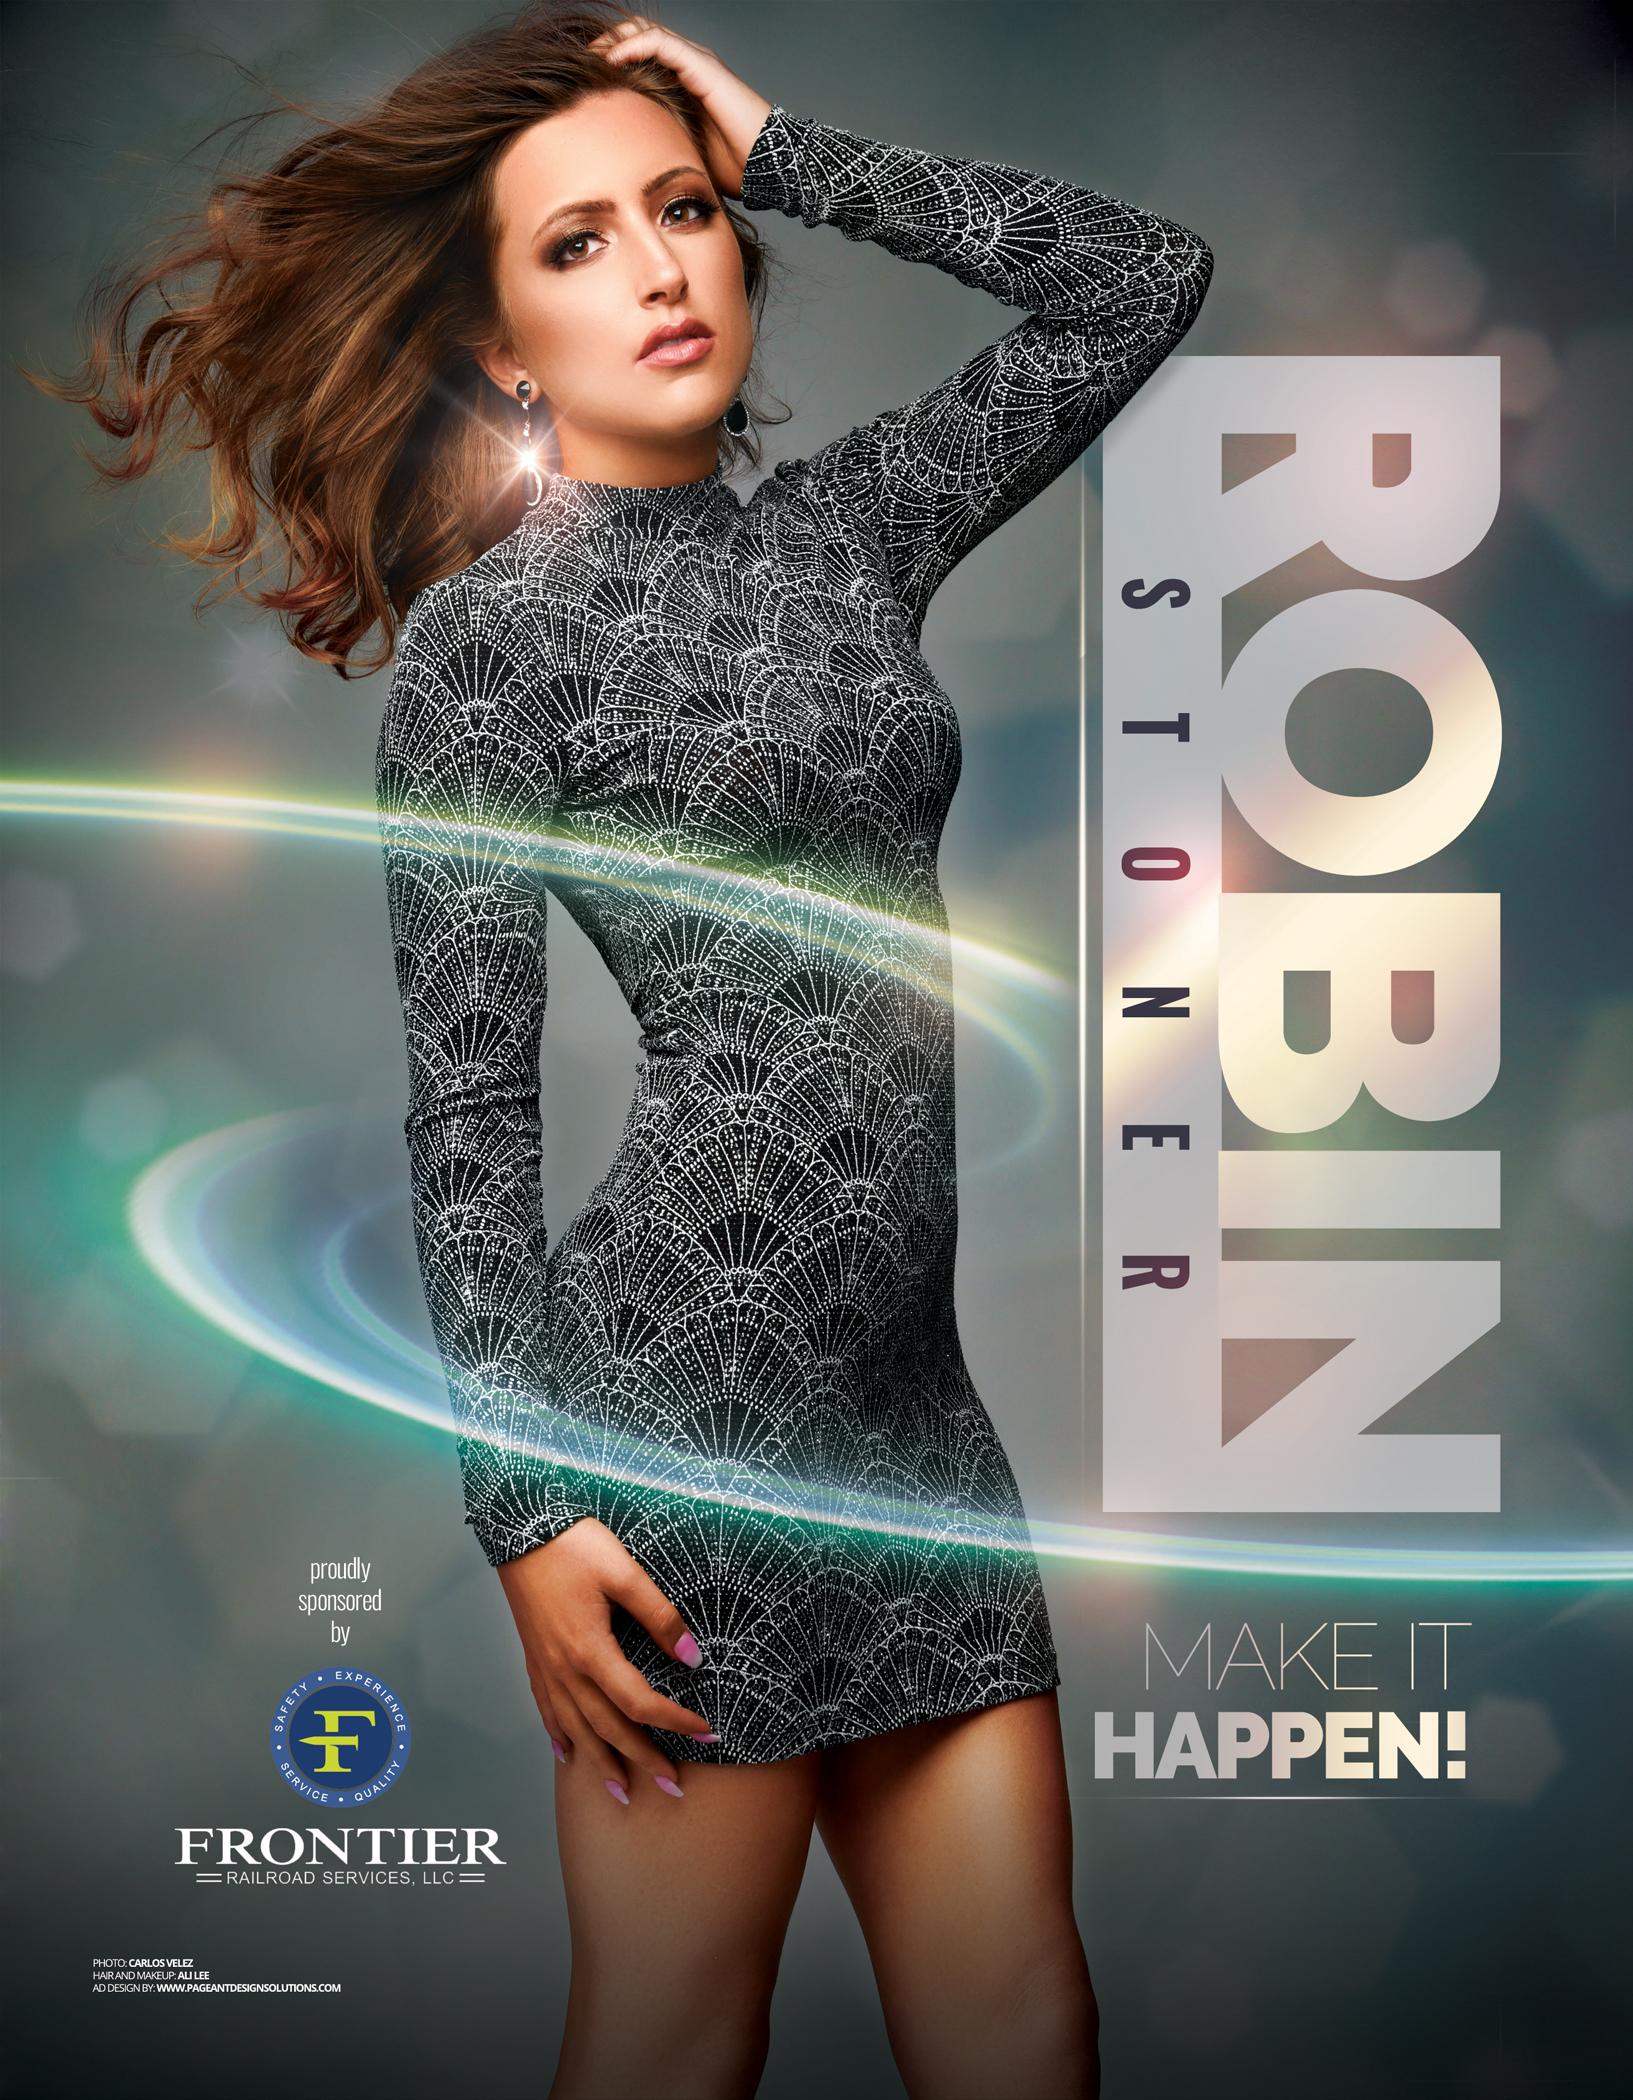 Stoner, Robin AD 1